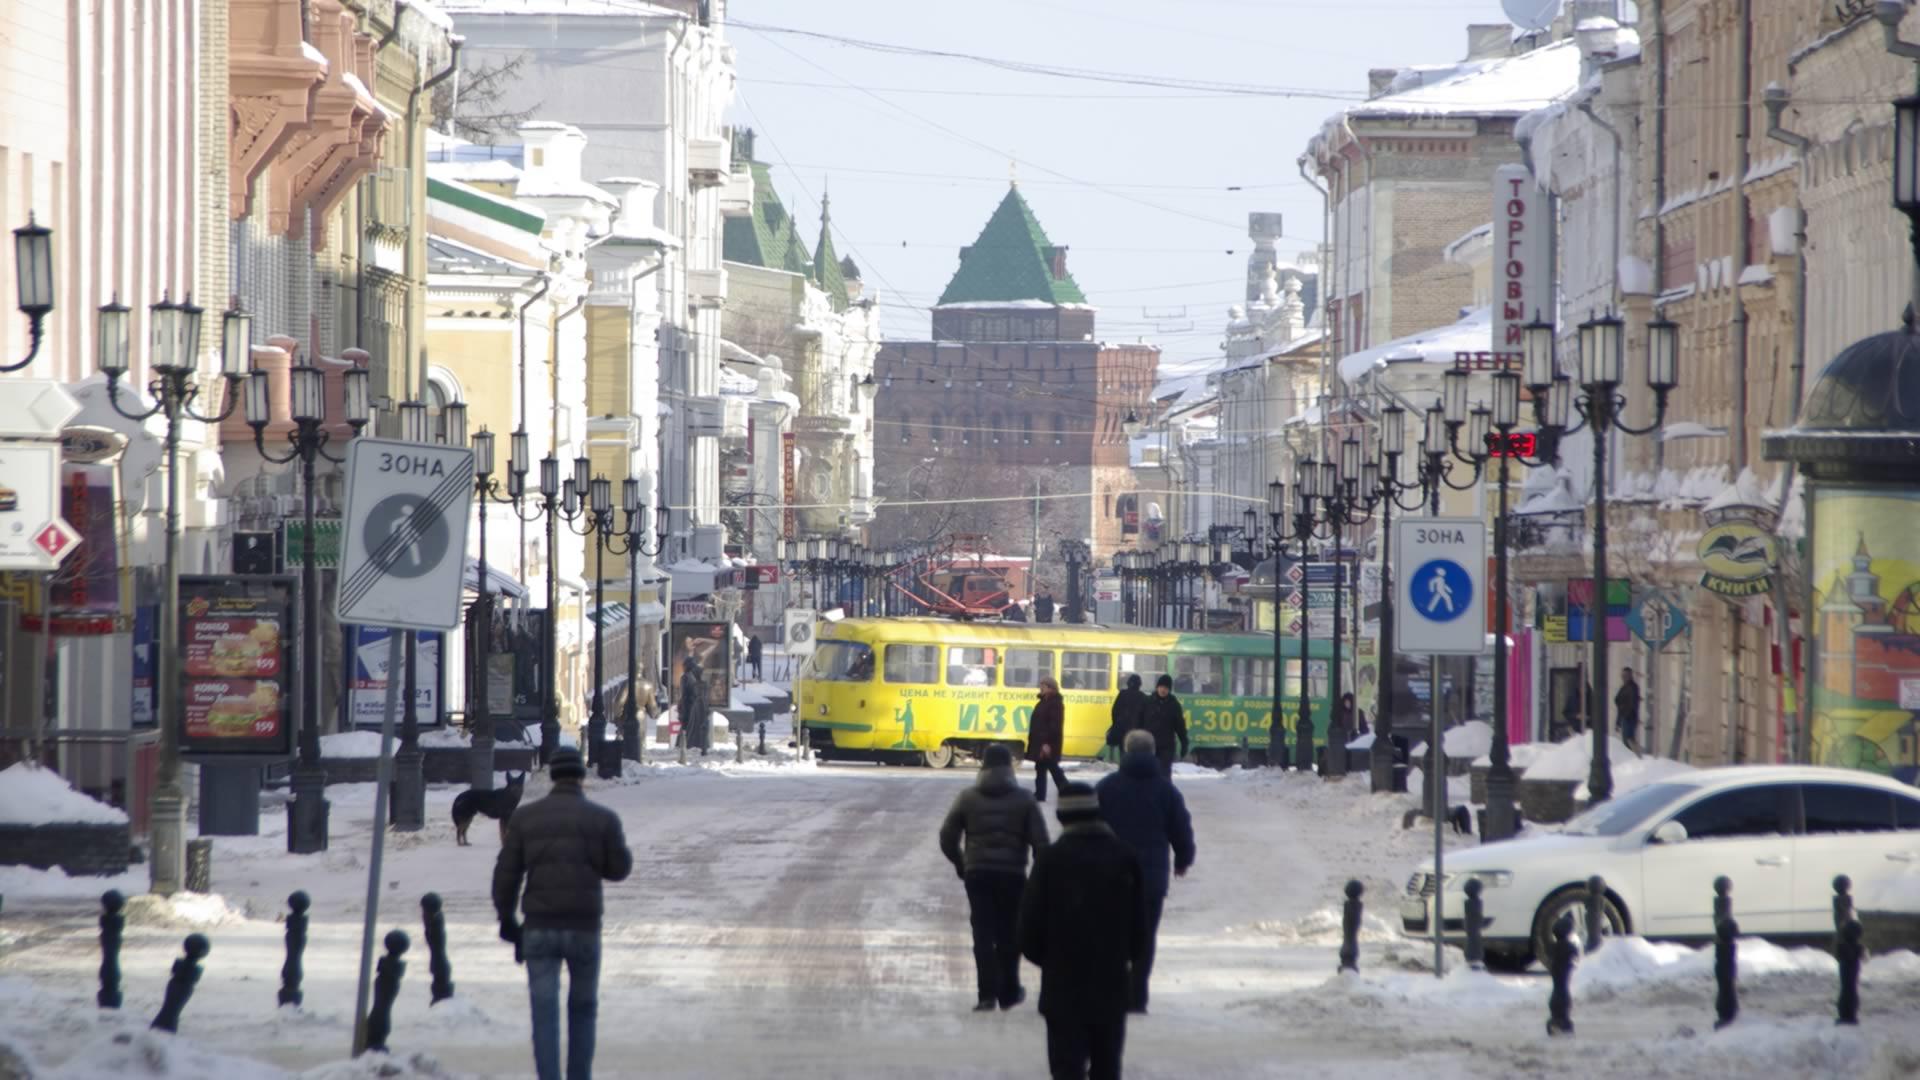 centre ville enneigé tramway russie